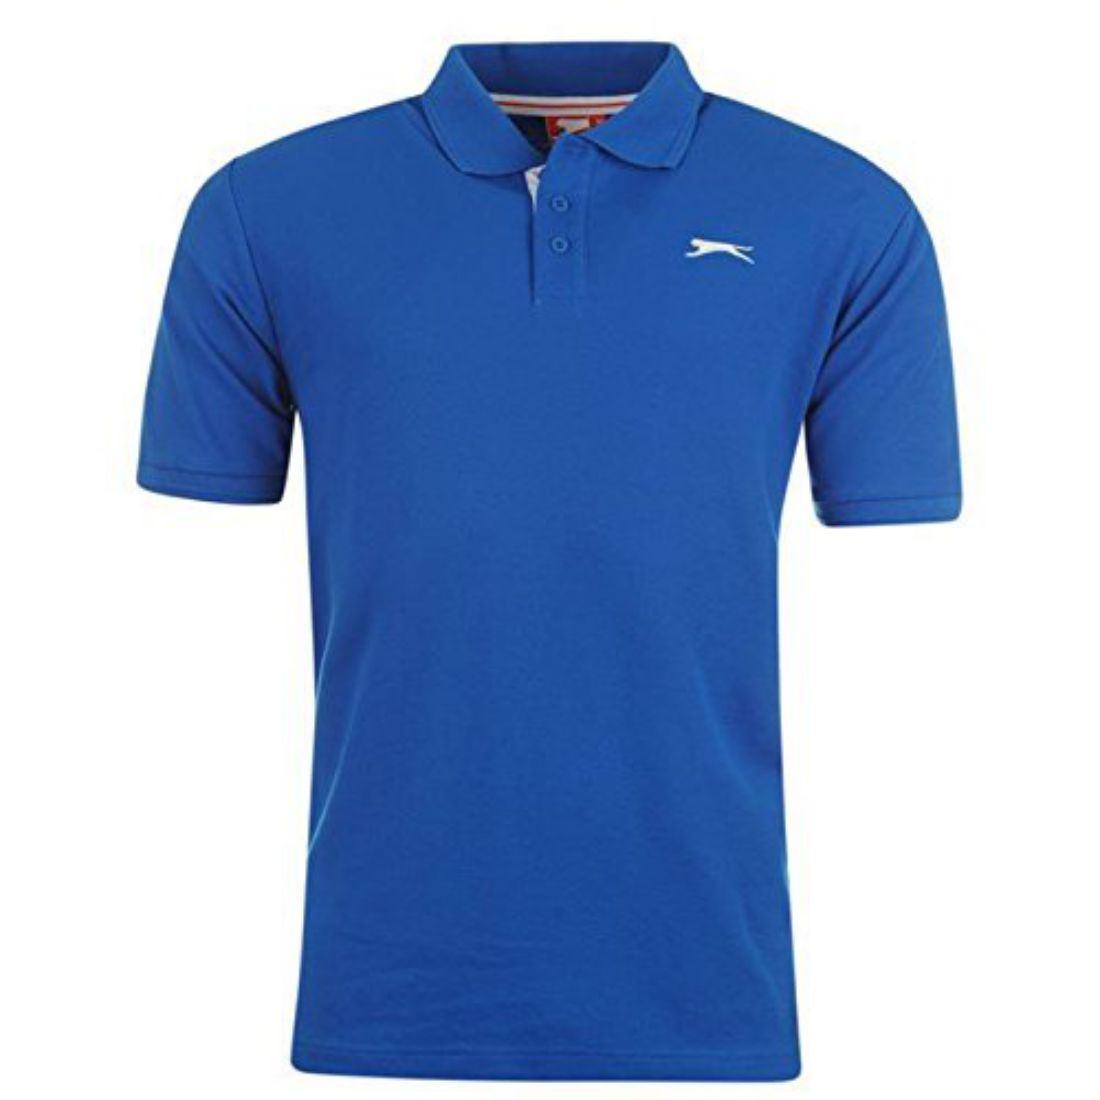 Slazenger Mens Clothing Short Sleeve Plain Polo Shirt Fashion Top